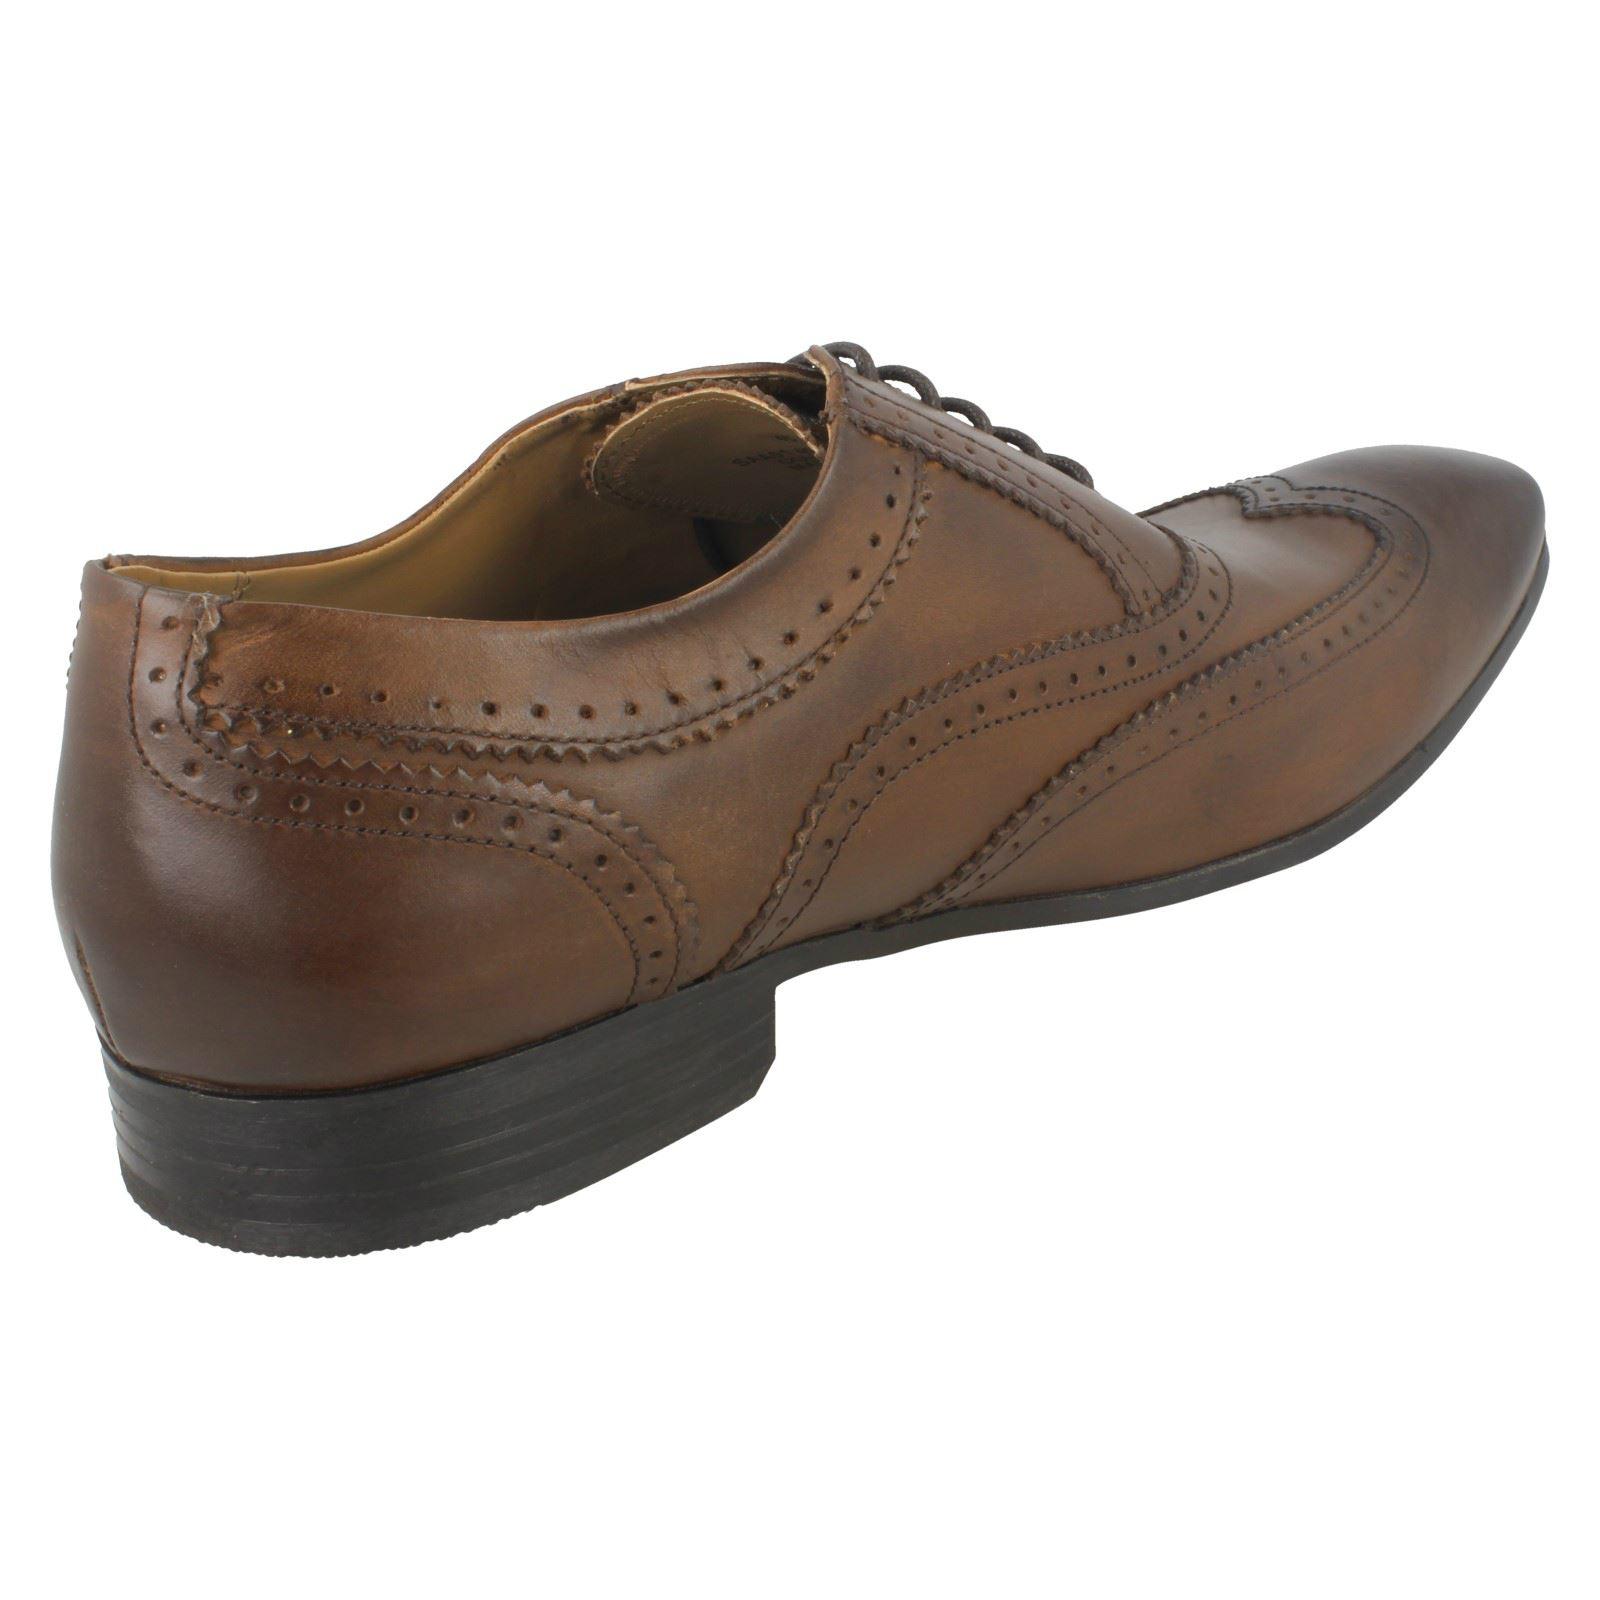 Herren Smart Base London Lace Up Smart Herren Schuhes Court 4ae1a8